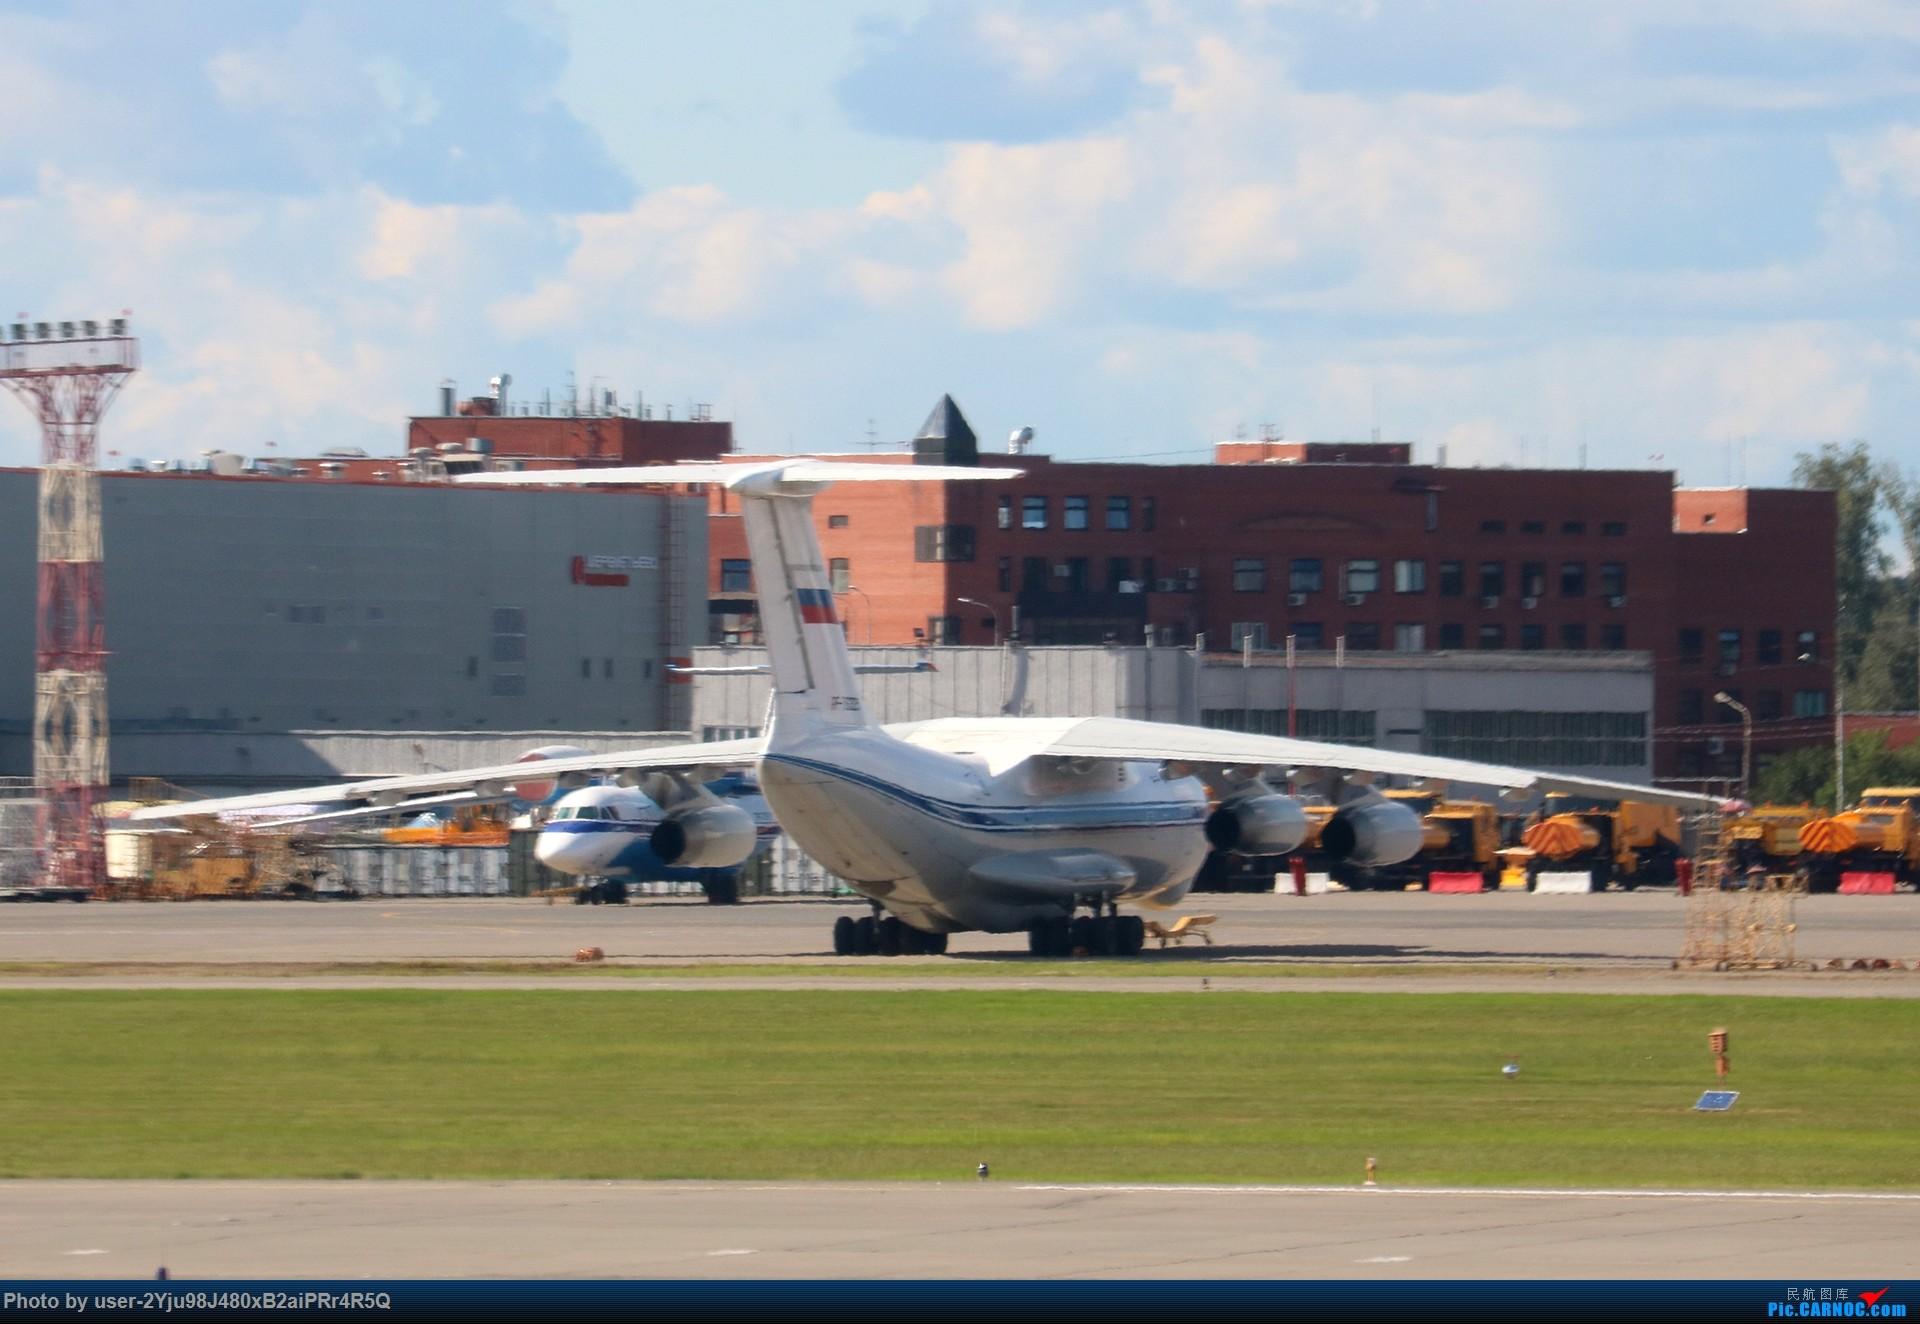 Re:[原创]LIULIU|一天两种机型三个国家四段航线五座城市的回家之路|西伯利亚上空的星光 ILYUSHIN IL-76  俄罗斯谢诺梅杰沃机场